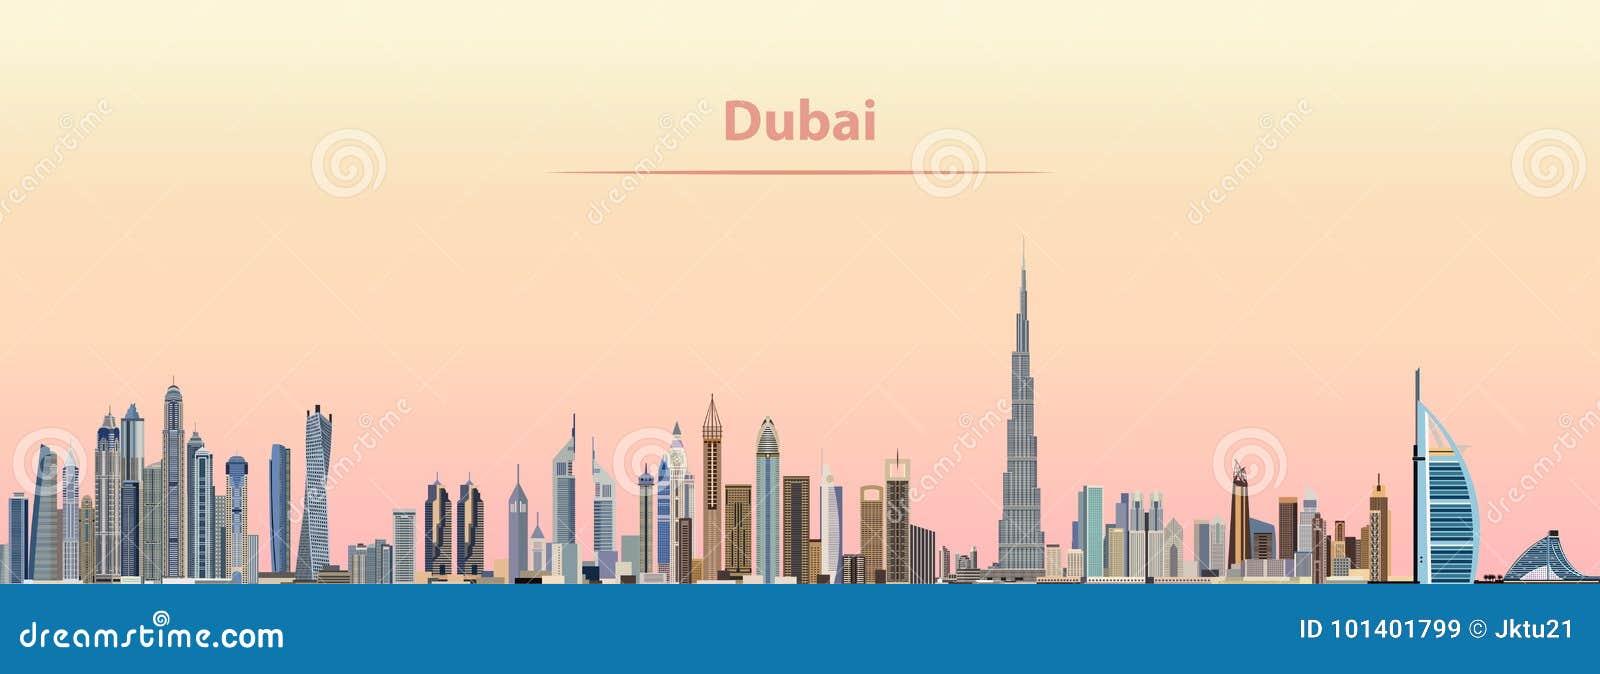 Download Vector Illustration Of Dubai City Skyline At Sunrise Stock Vector - Illustration of silhouette, architecture: 101401799